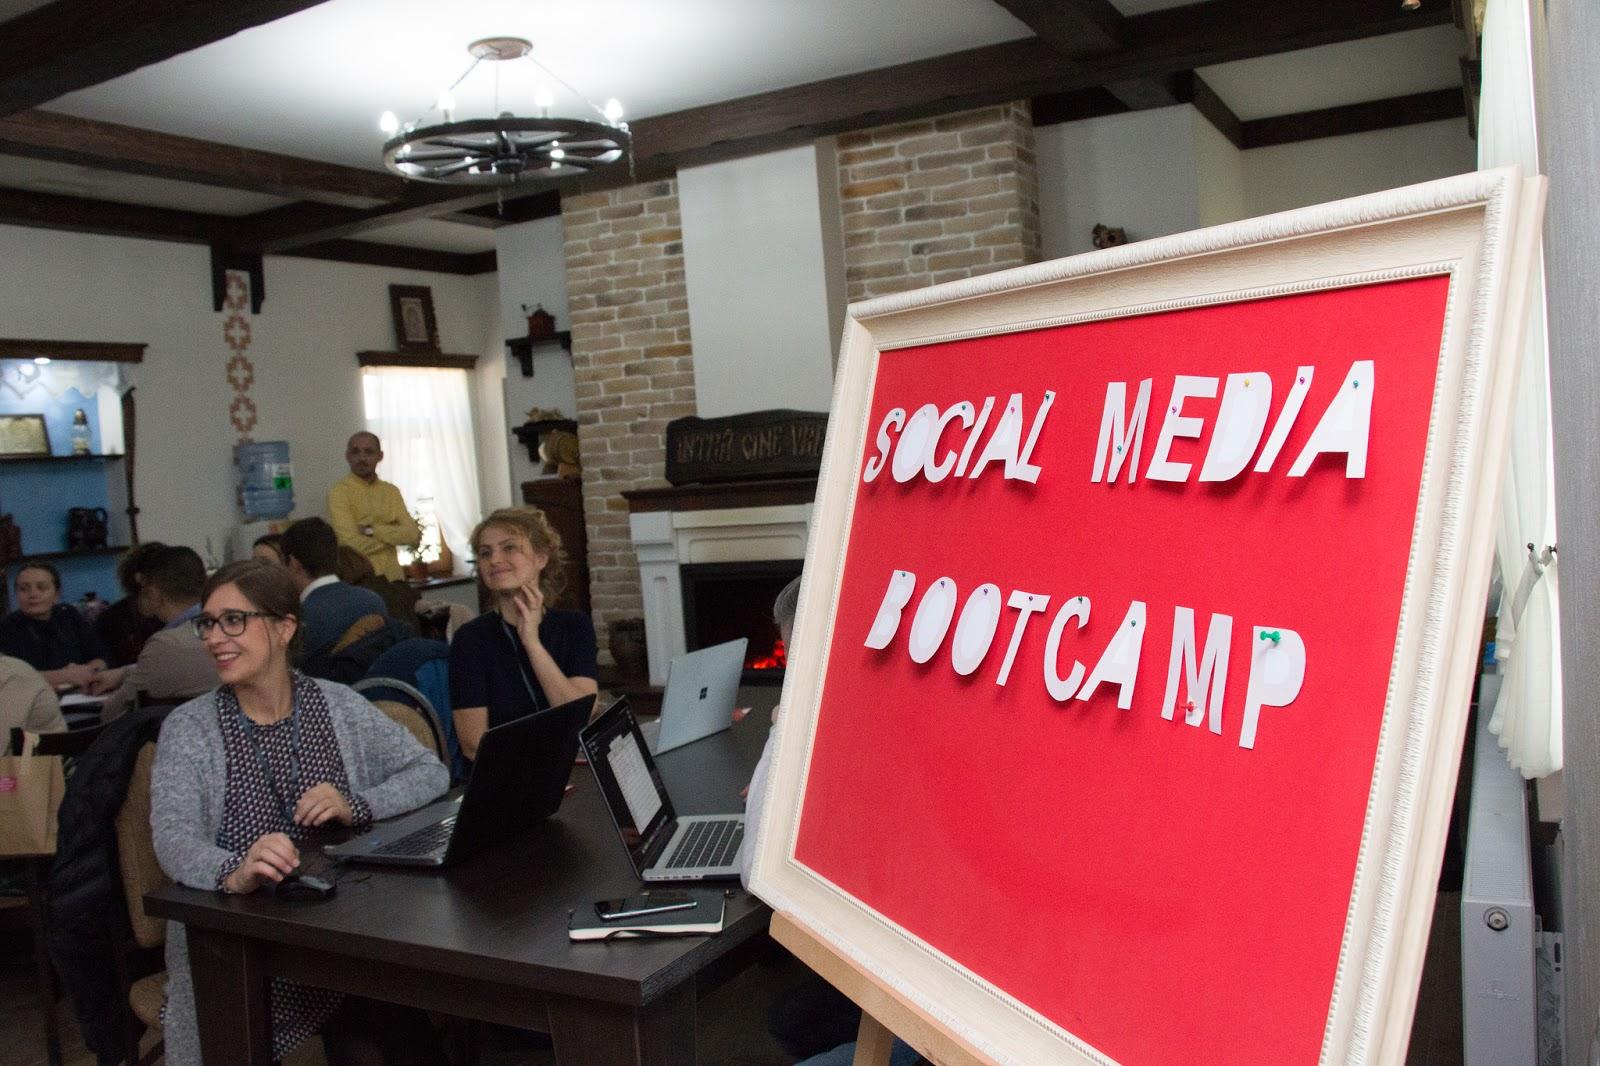 social%2Bmedia%2Bbootcamp%2Bmihaela%2Bjosanu.jpg